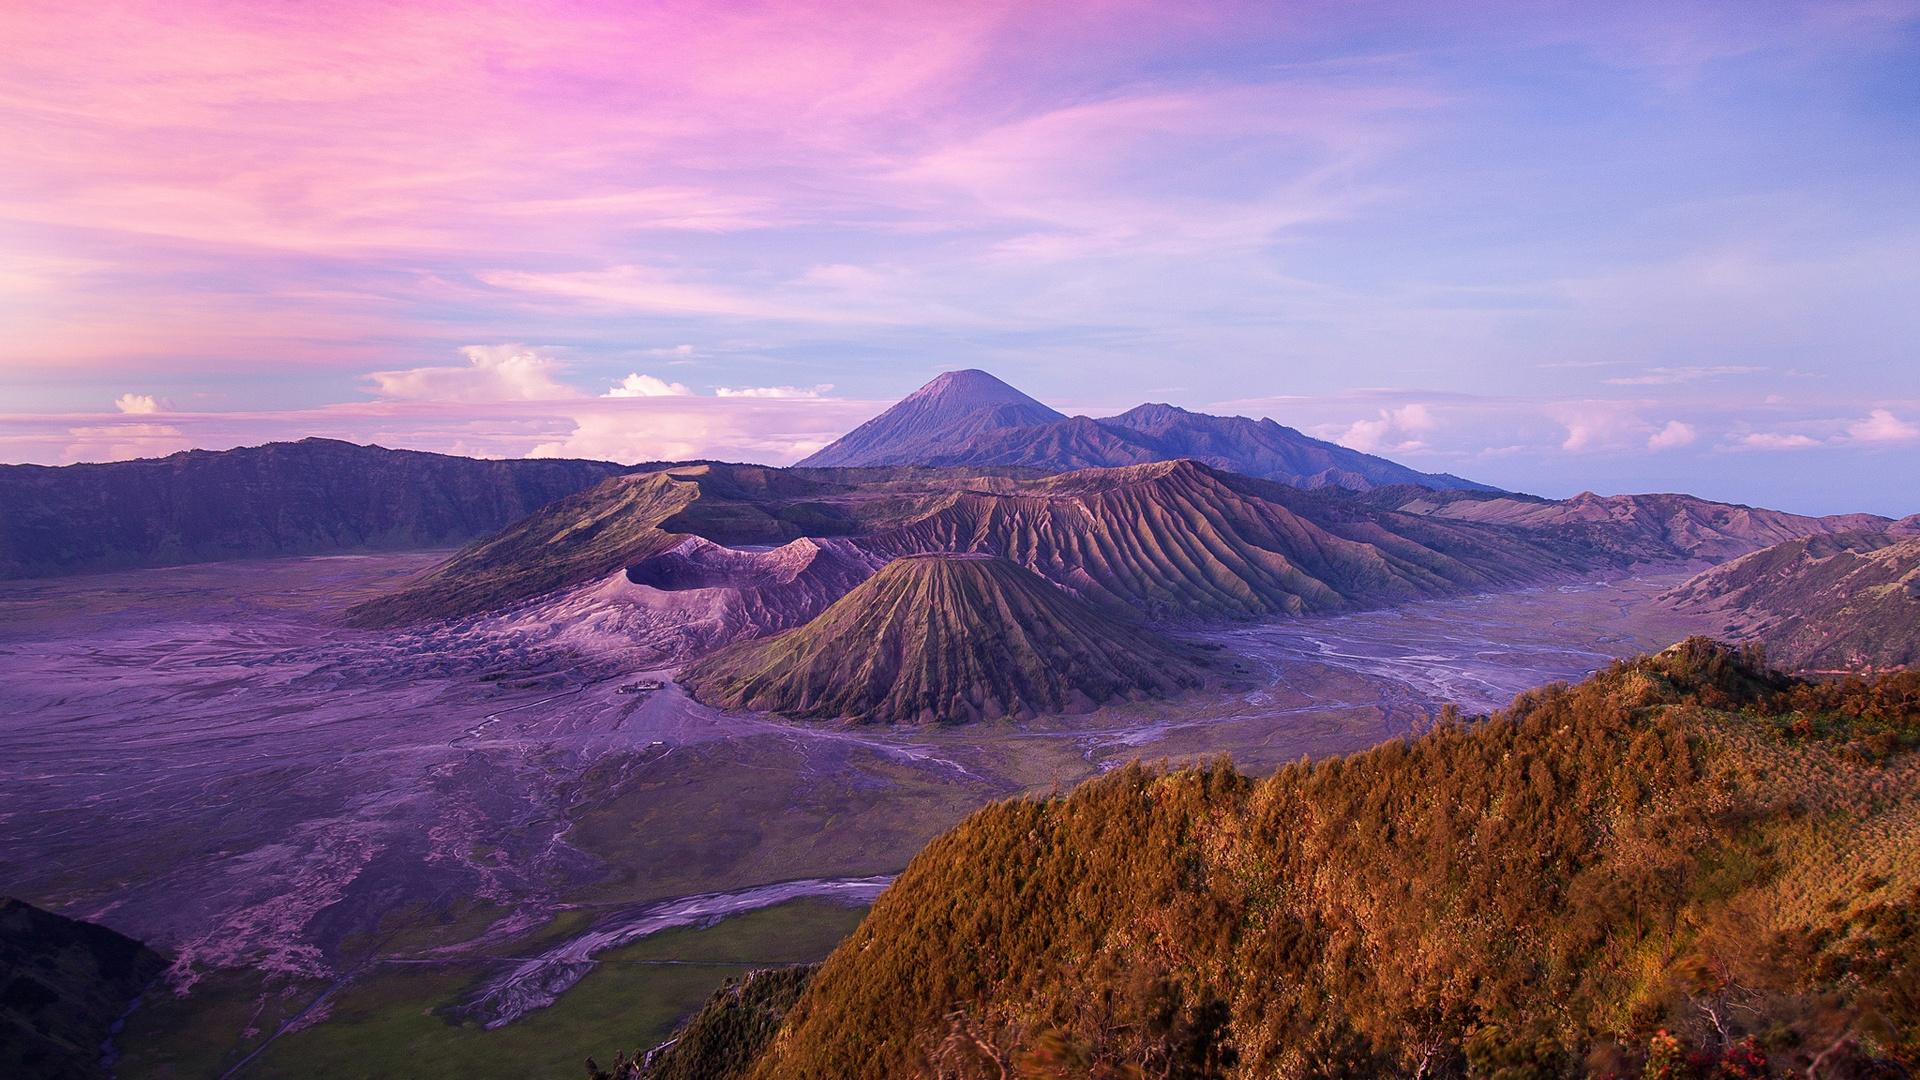 Indonesia dusk landscape full hd desktop wallpapers 1080p - Desktop wallpaper hd free download 1366x768 ...